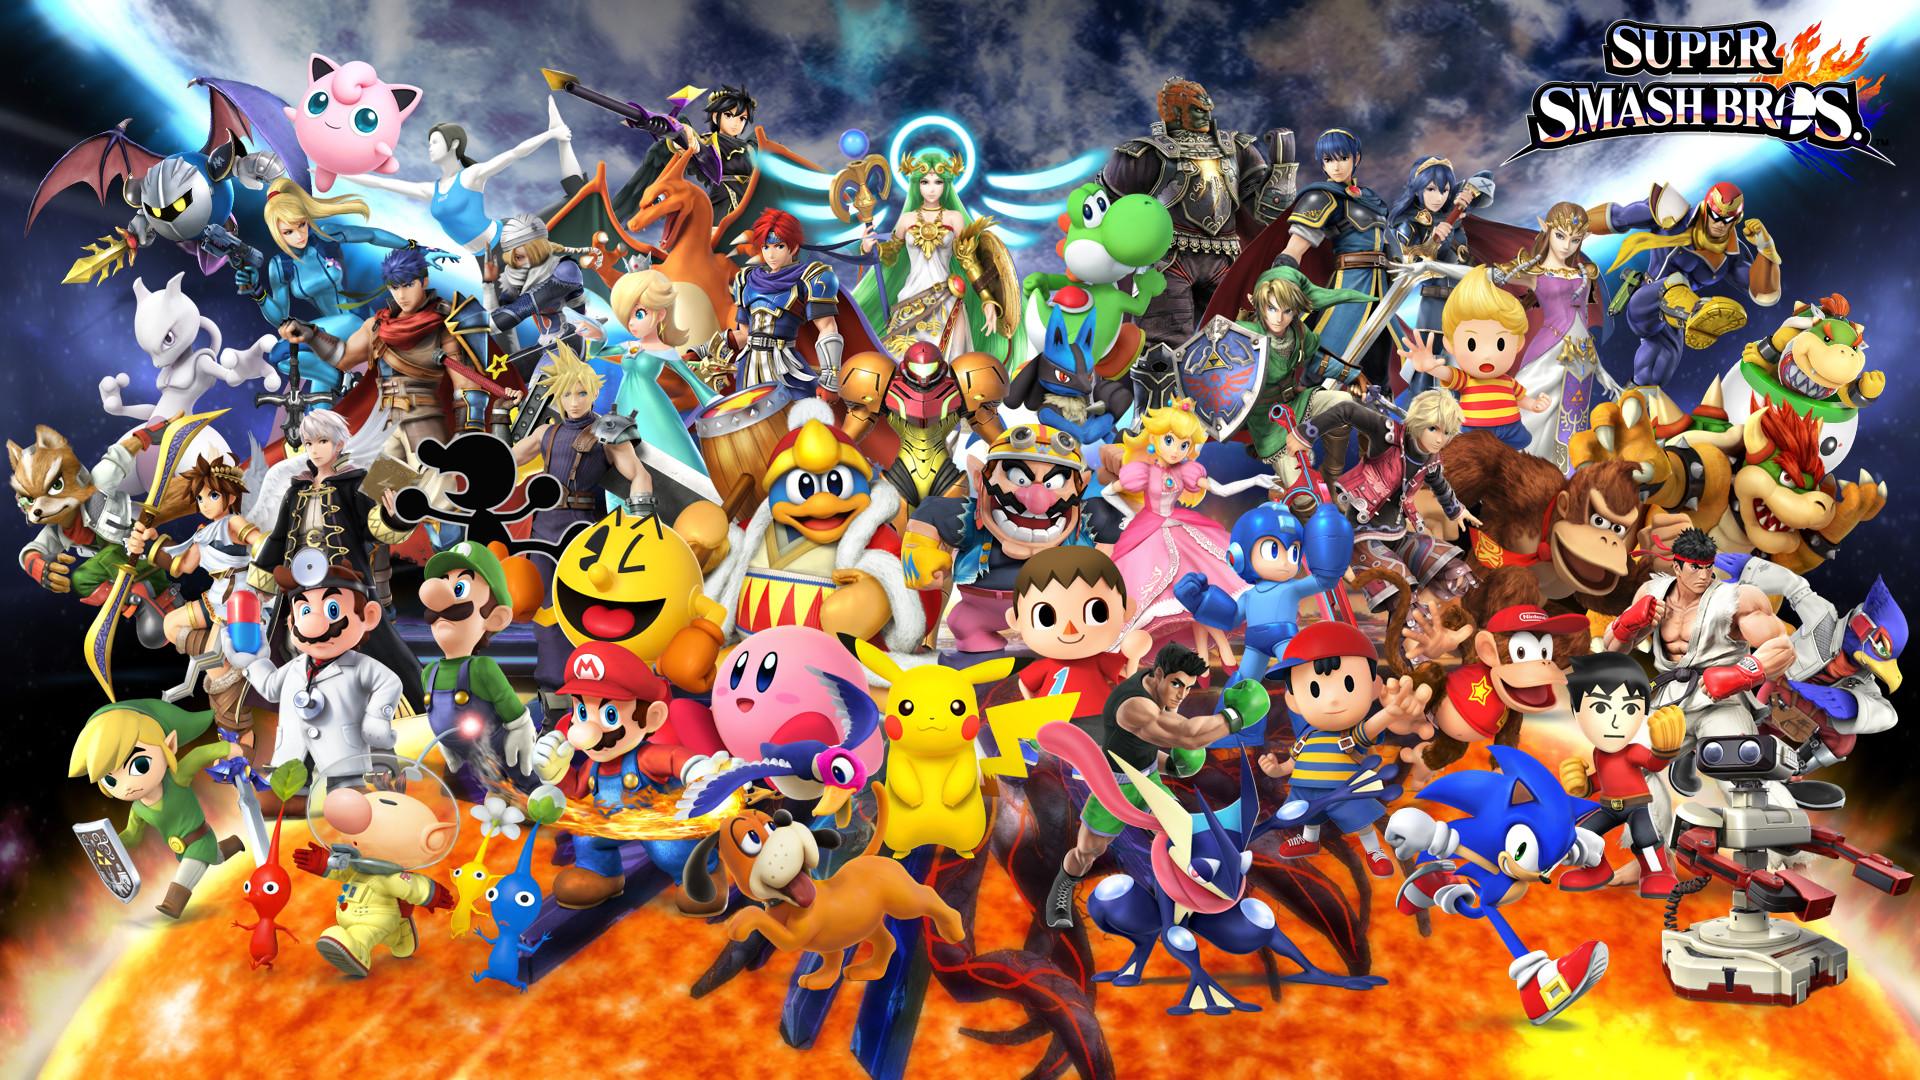 Super Smash Bros 4 Wallpaper